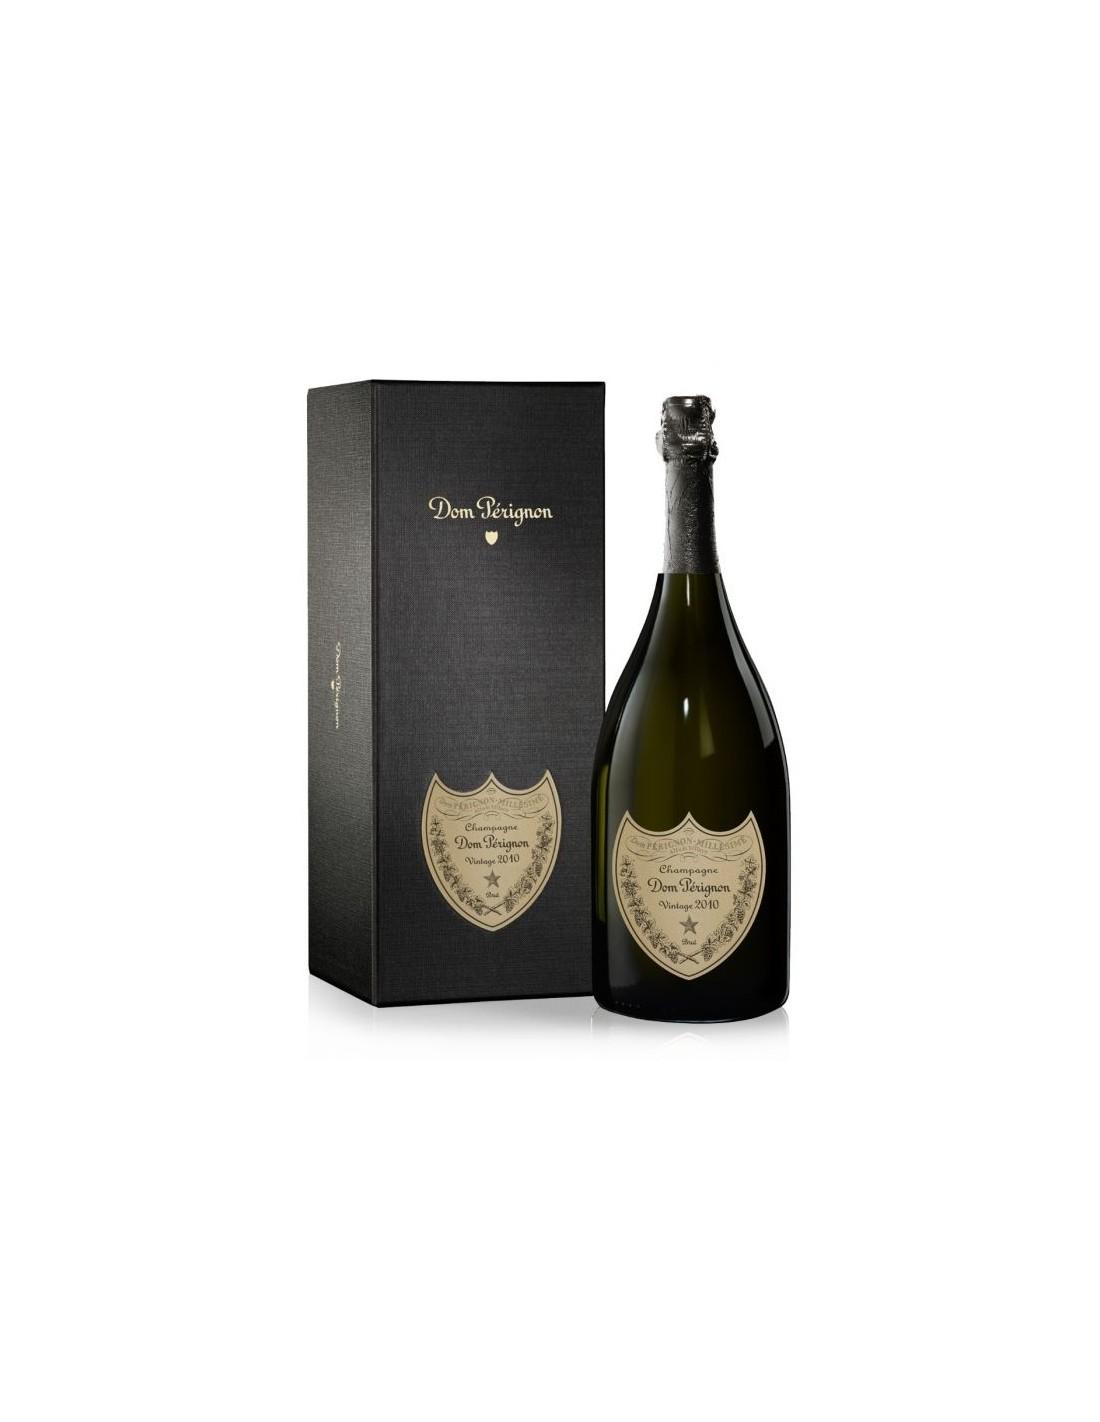 Sampanie, Dom Perignon Champagne Vintage 2010, 0.75L, 12.5% alc., Franta